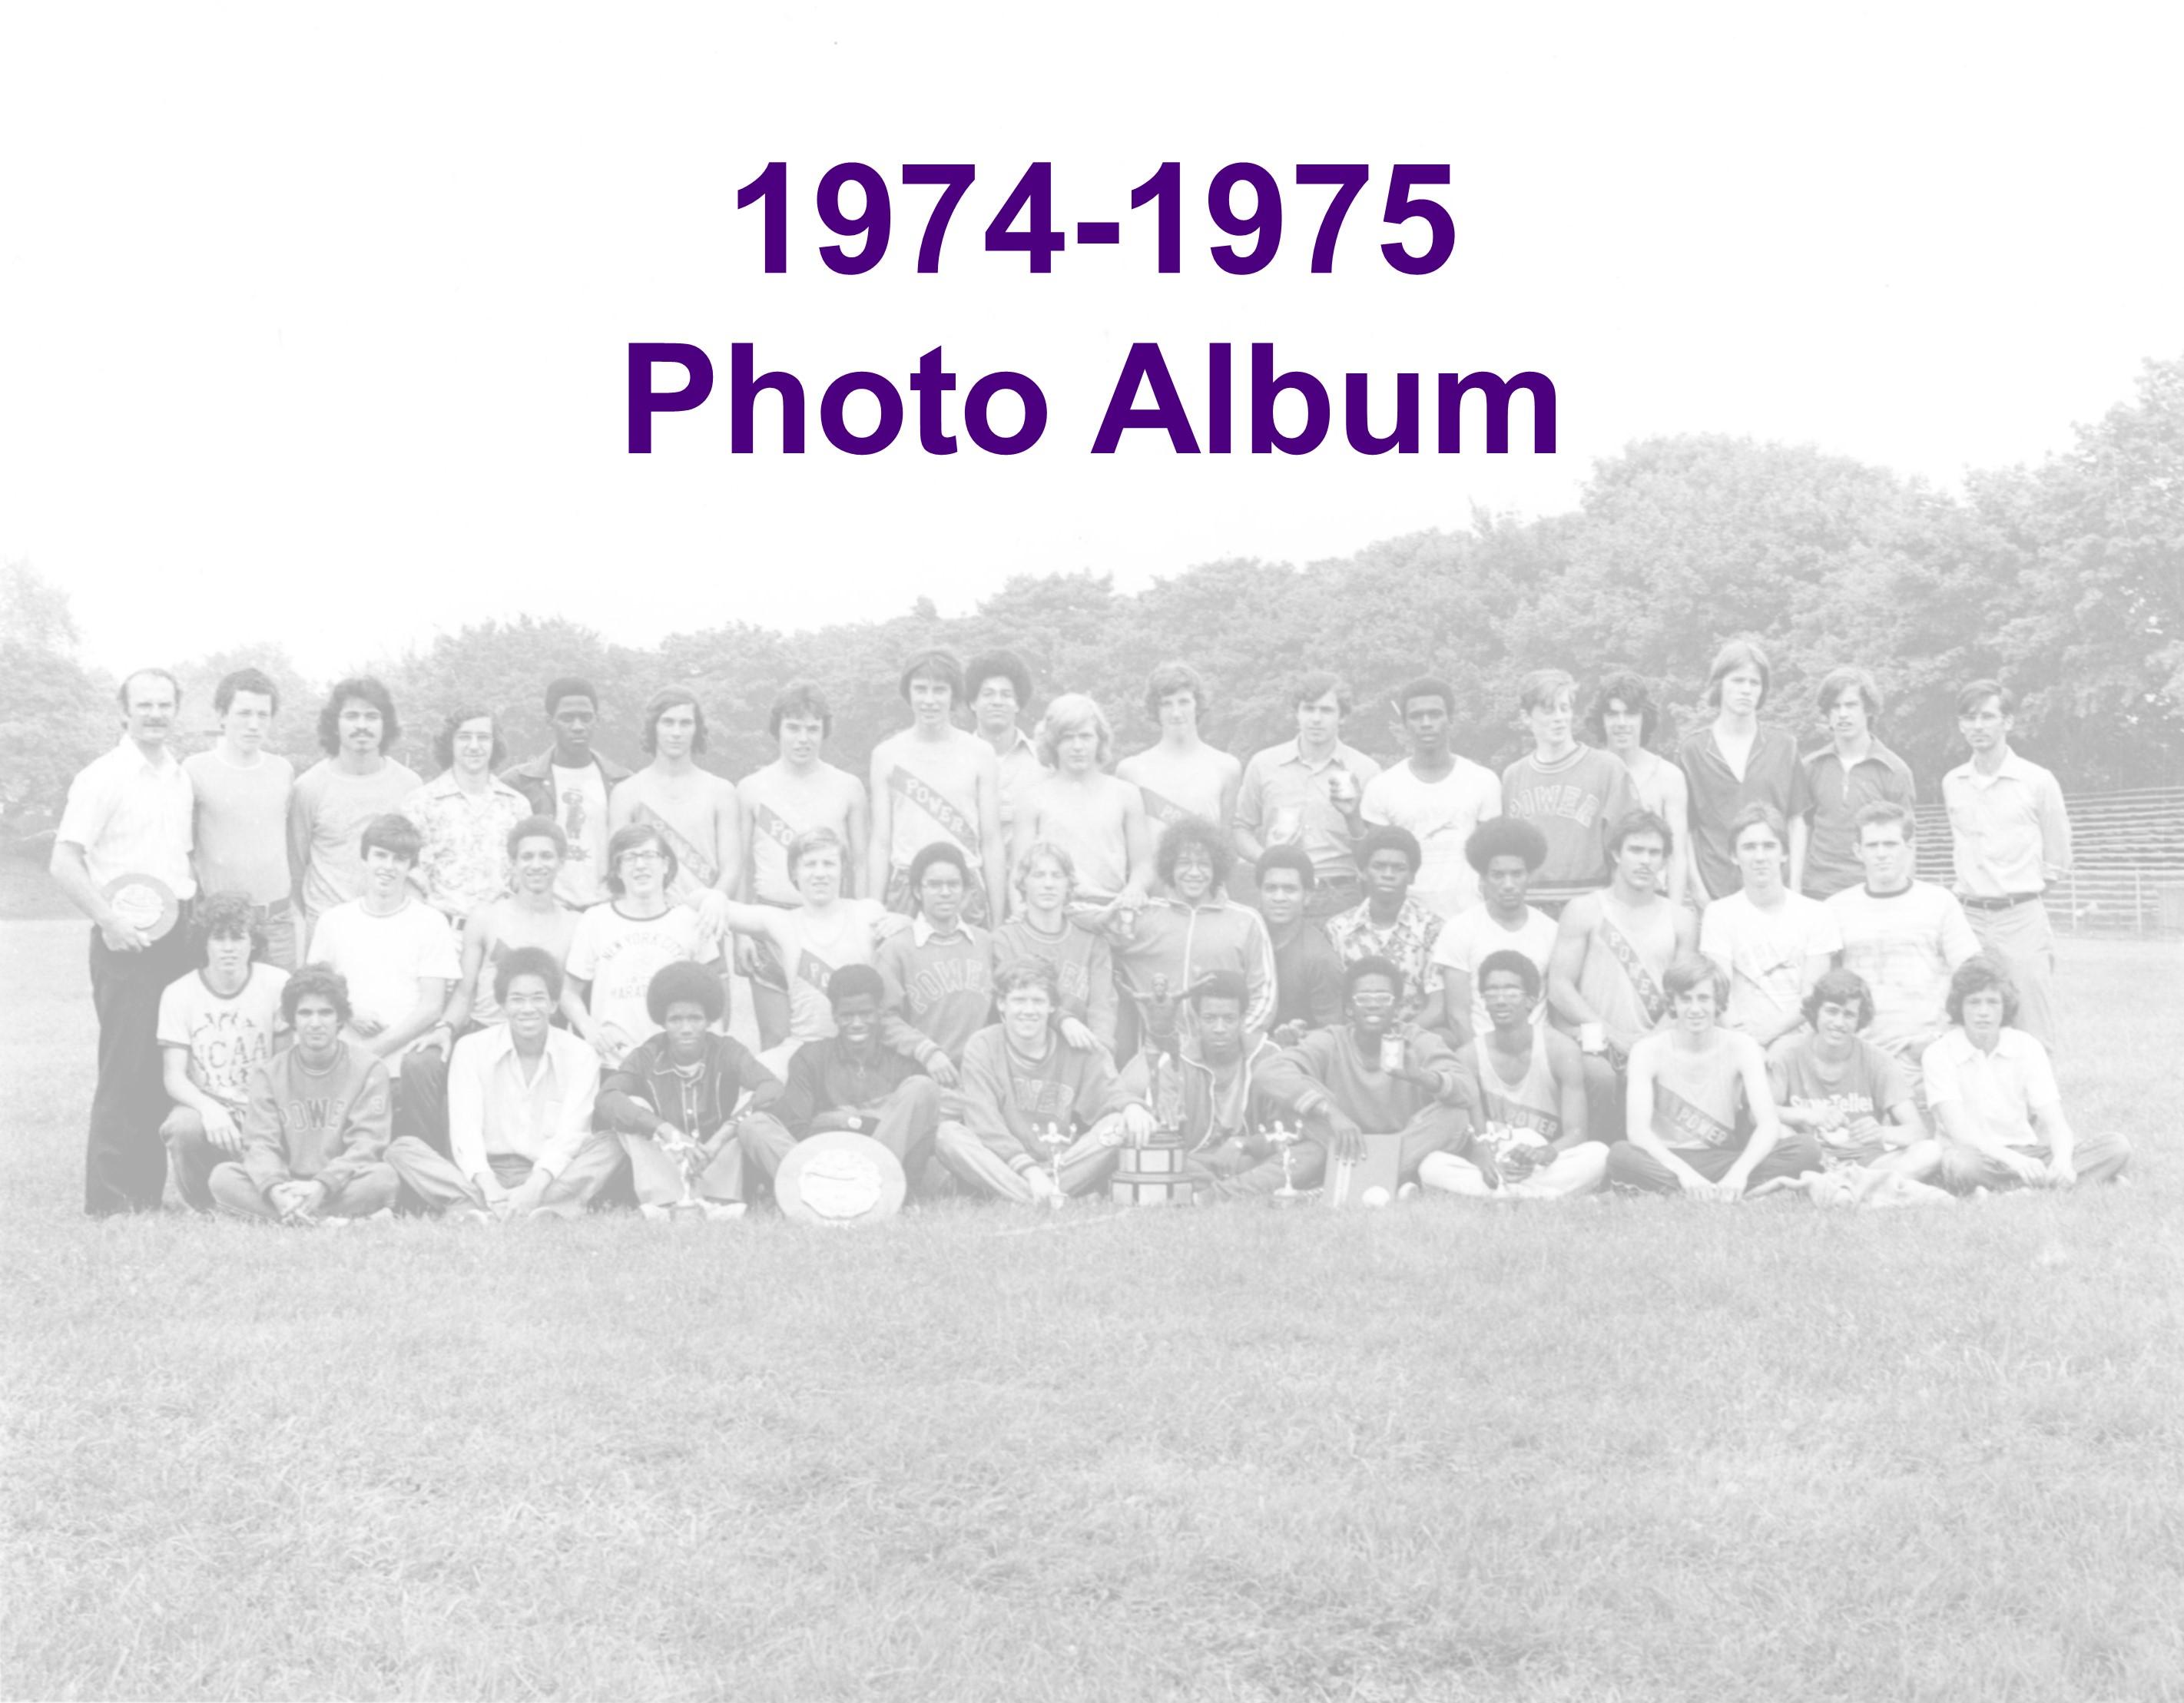 1974-1975 Photos Cover Image